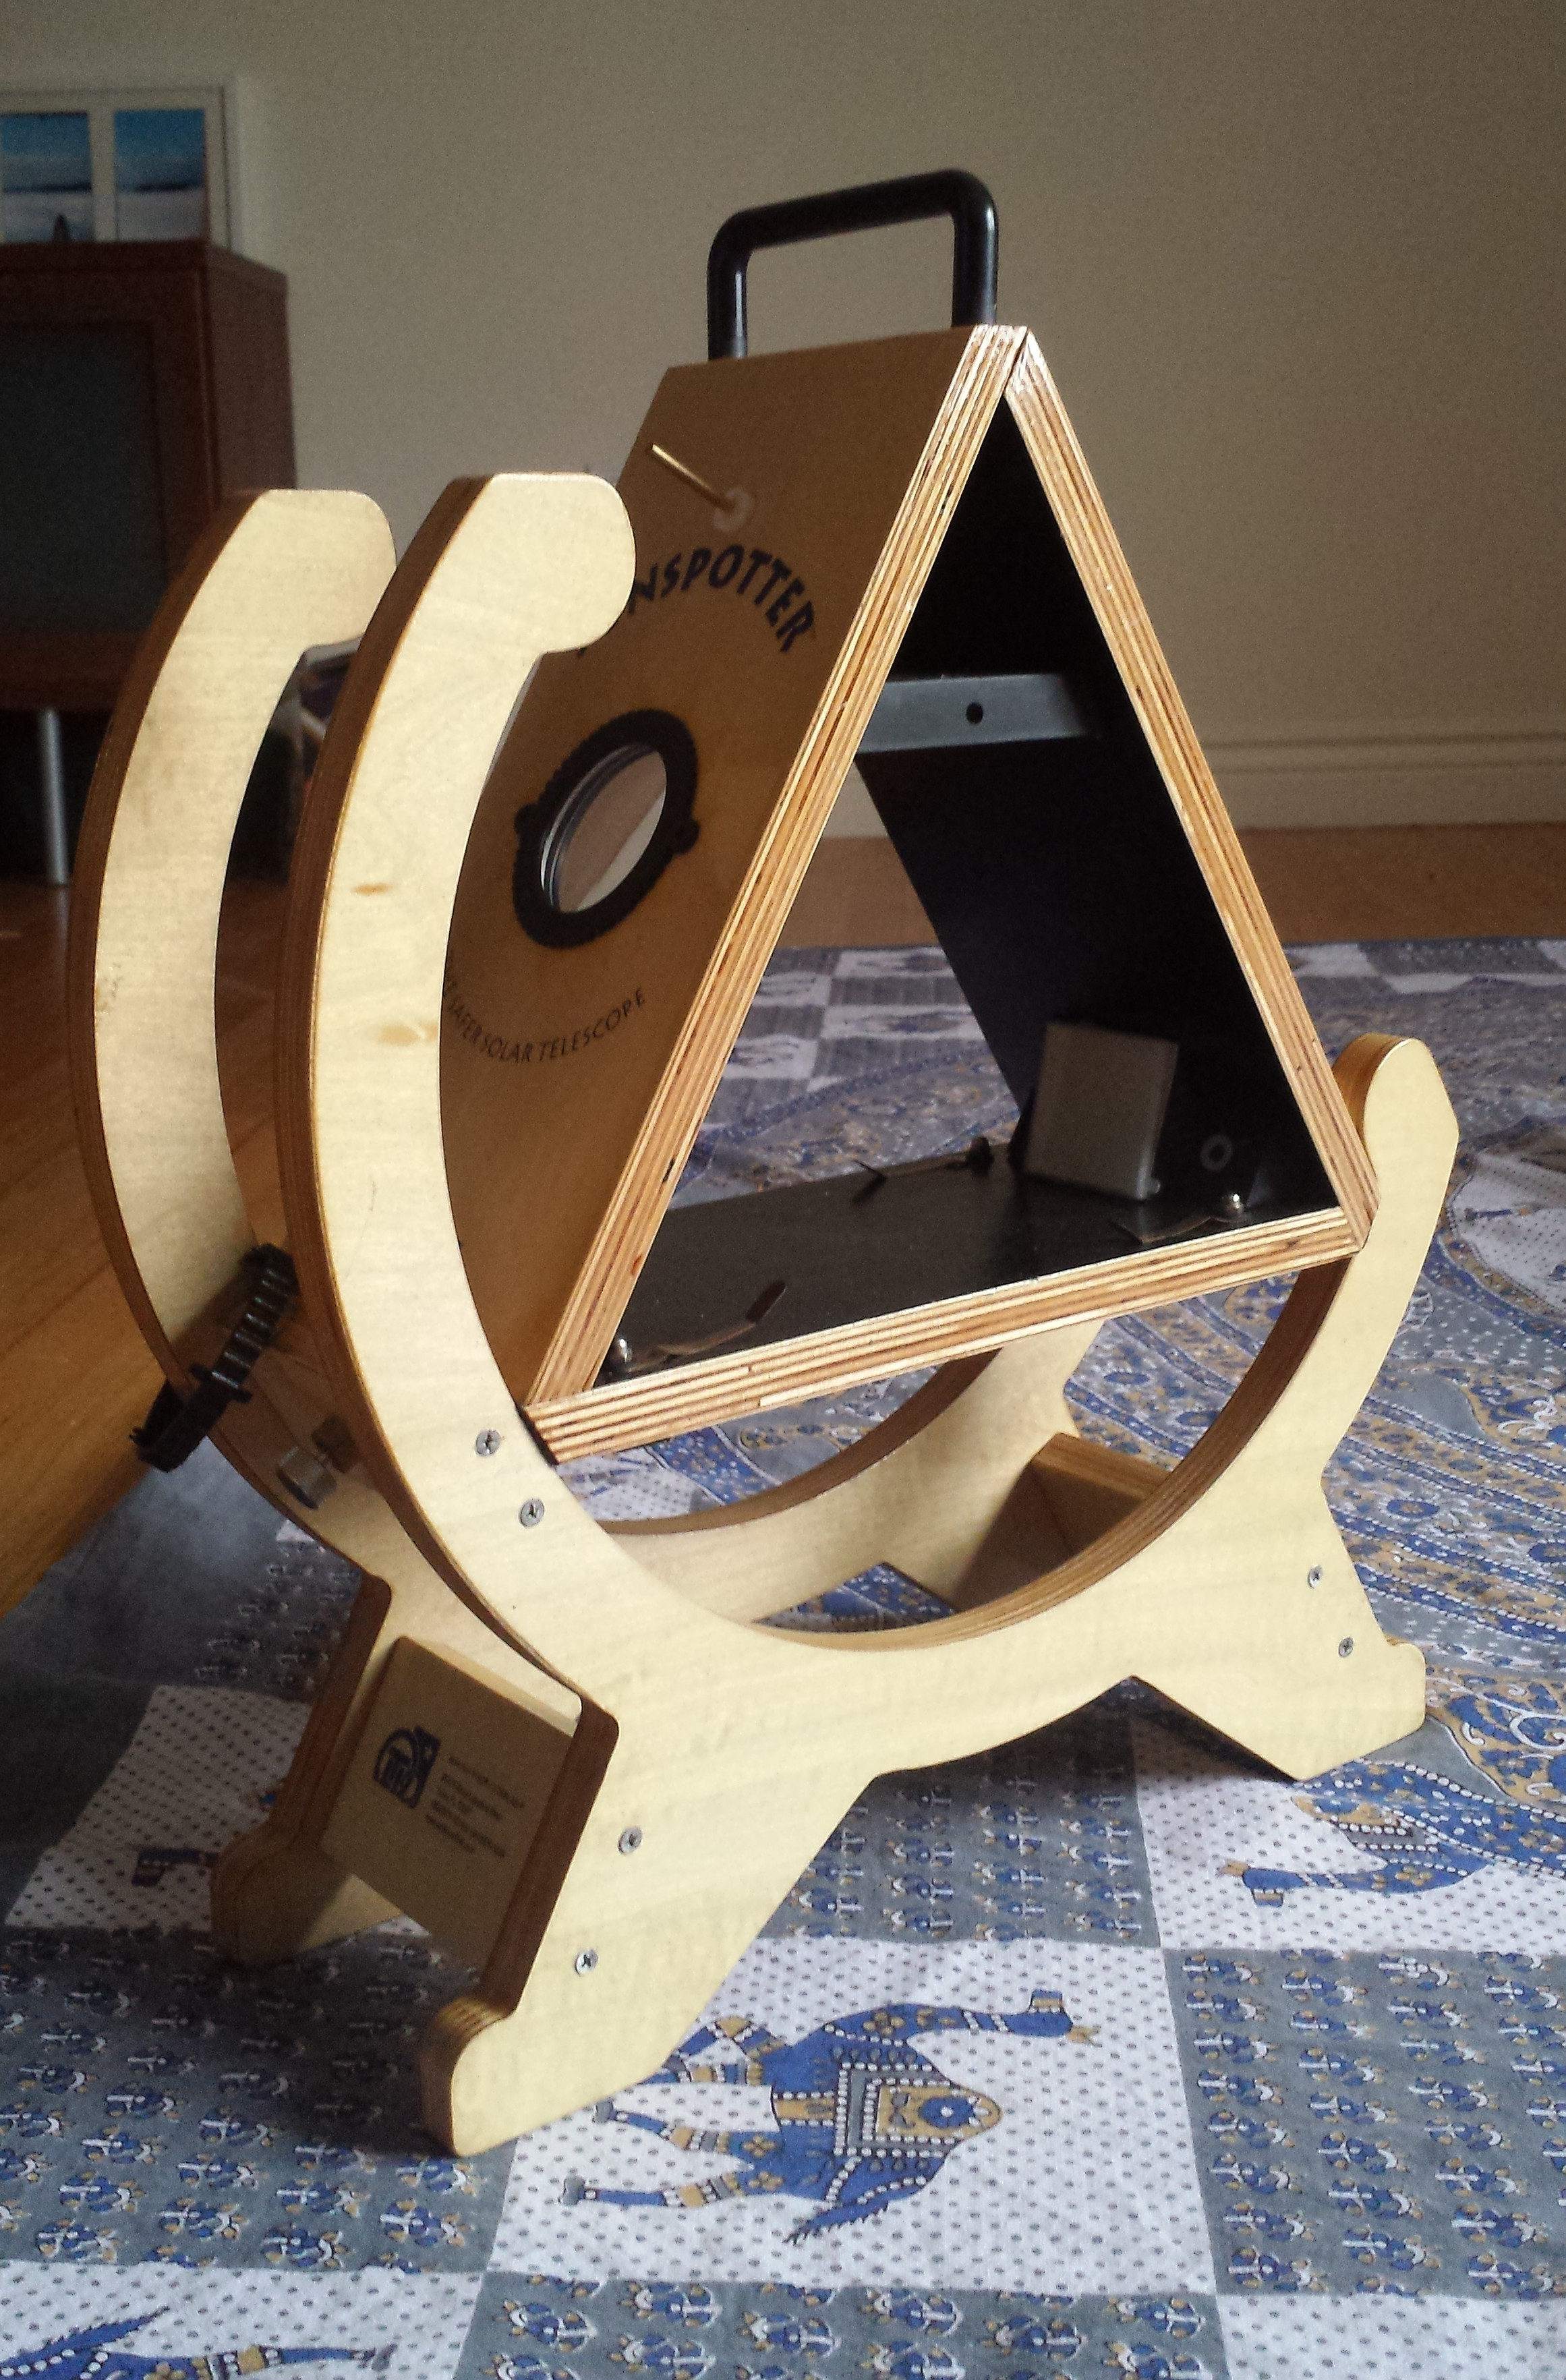 The Galileo Mobile Sunspotter telescope